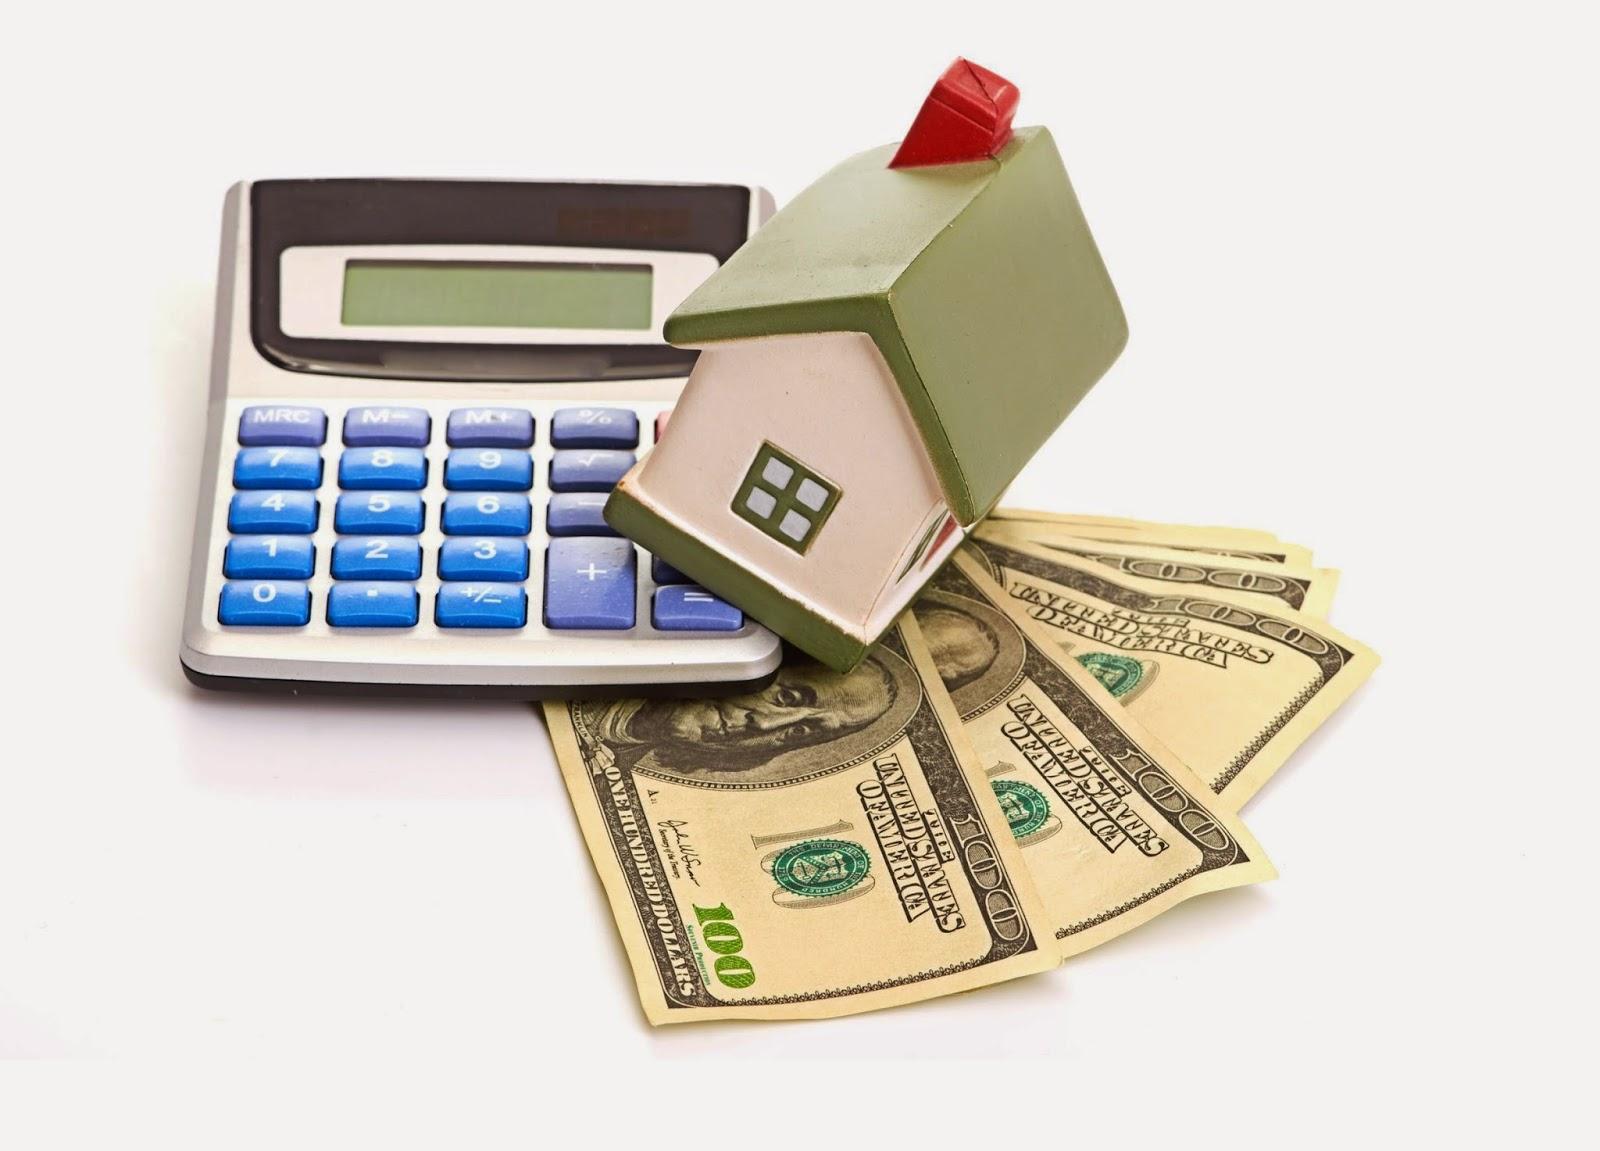 tjc mortgage company birmingham alabama